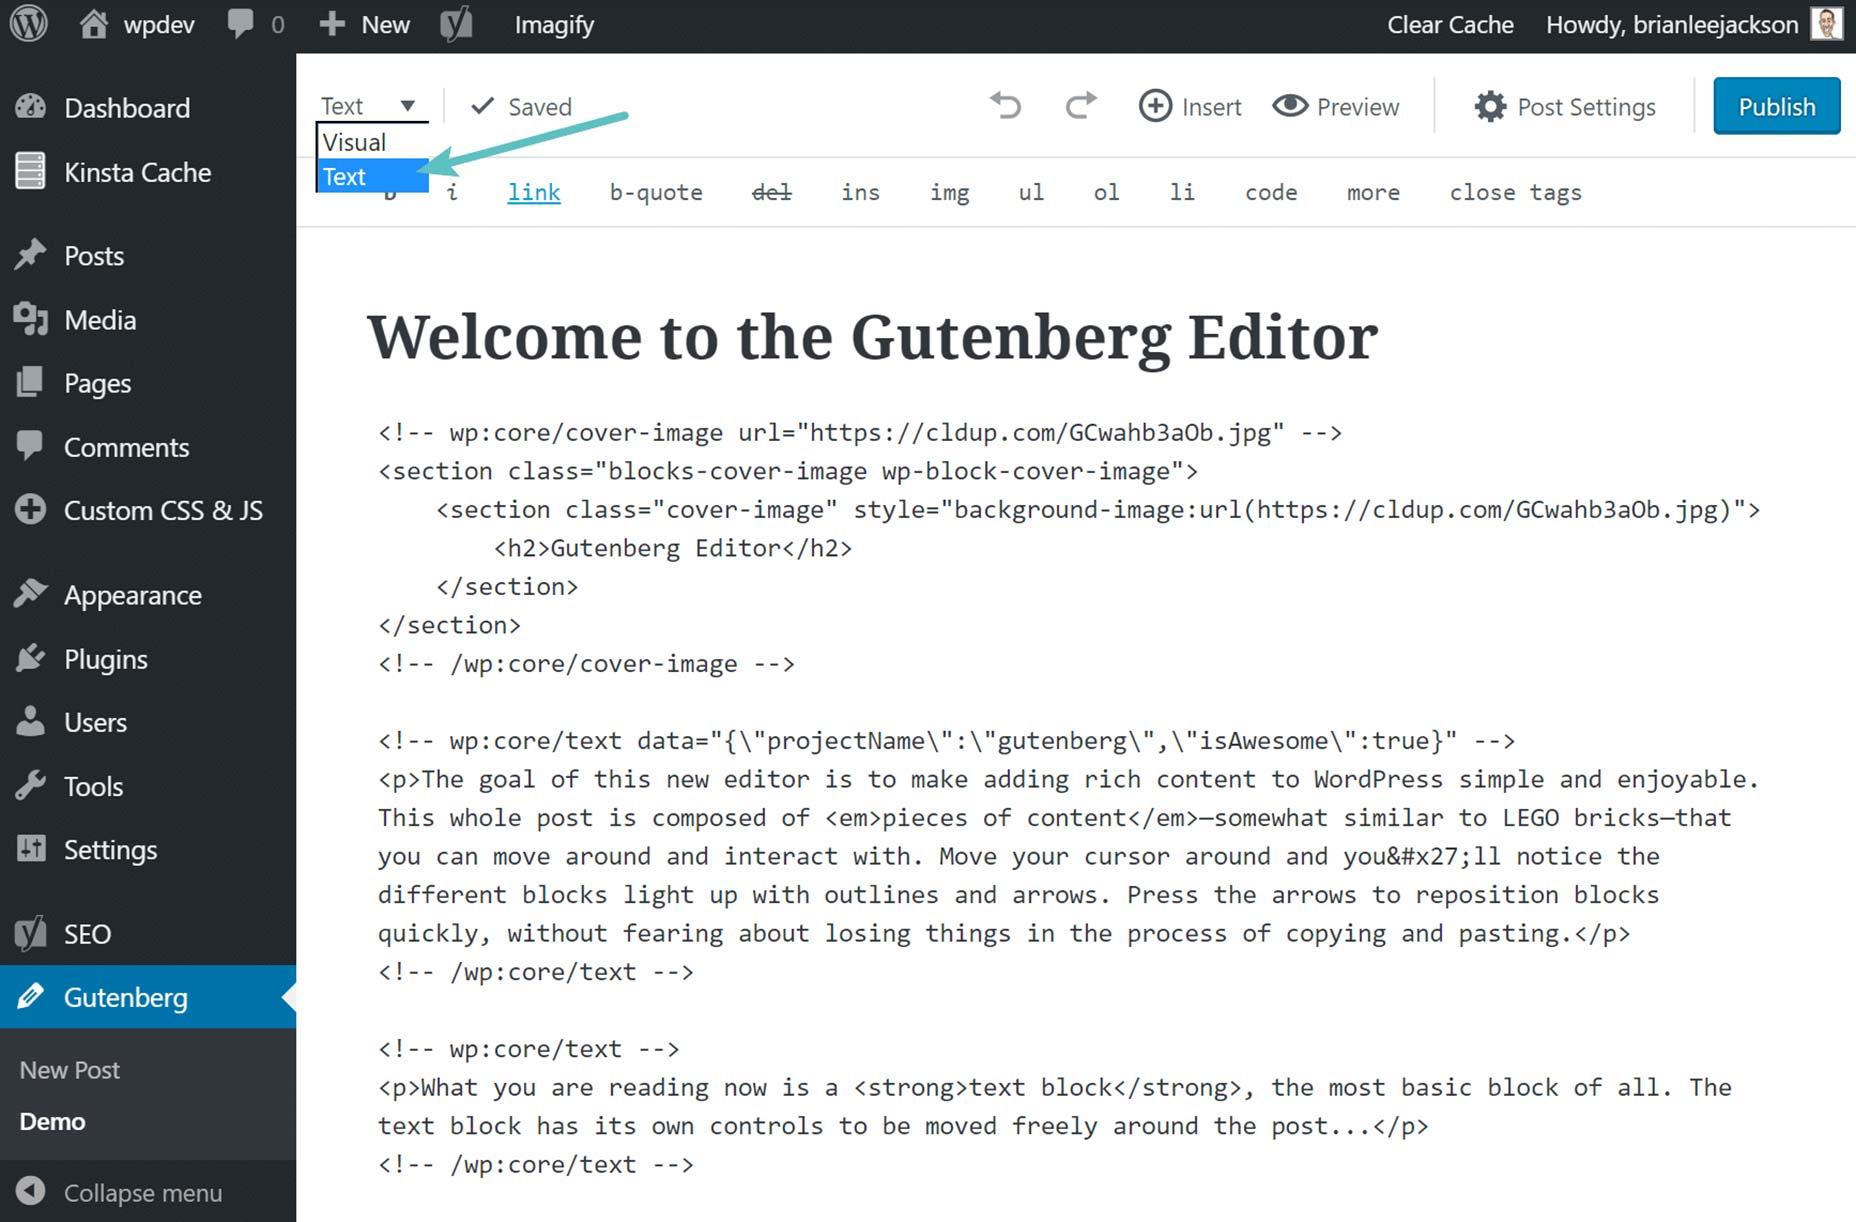 gutenberg-text-editor